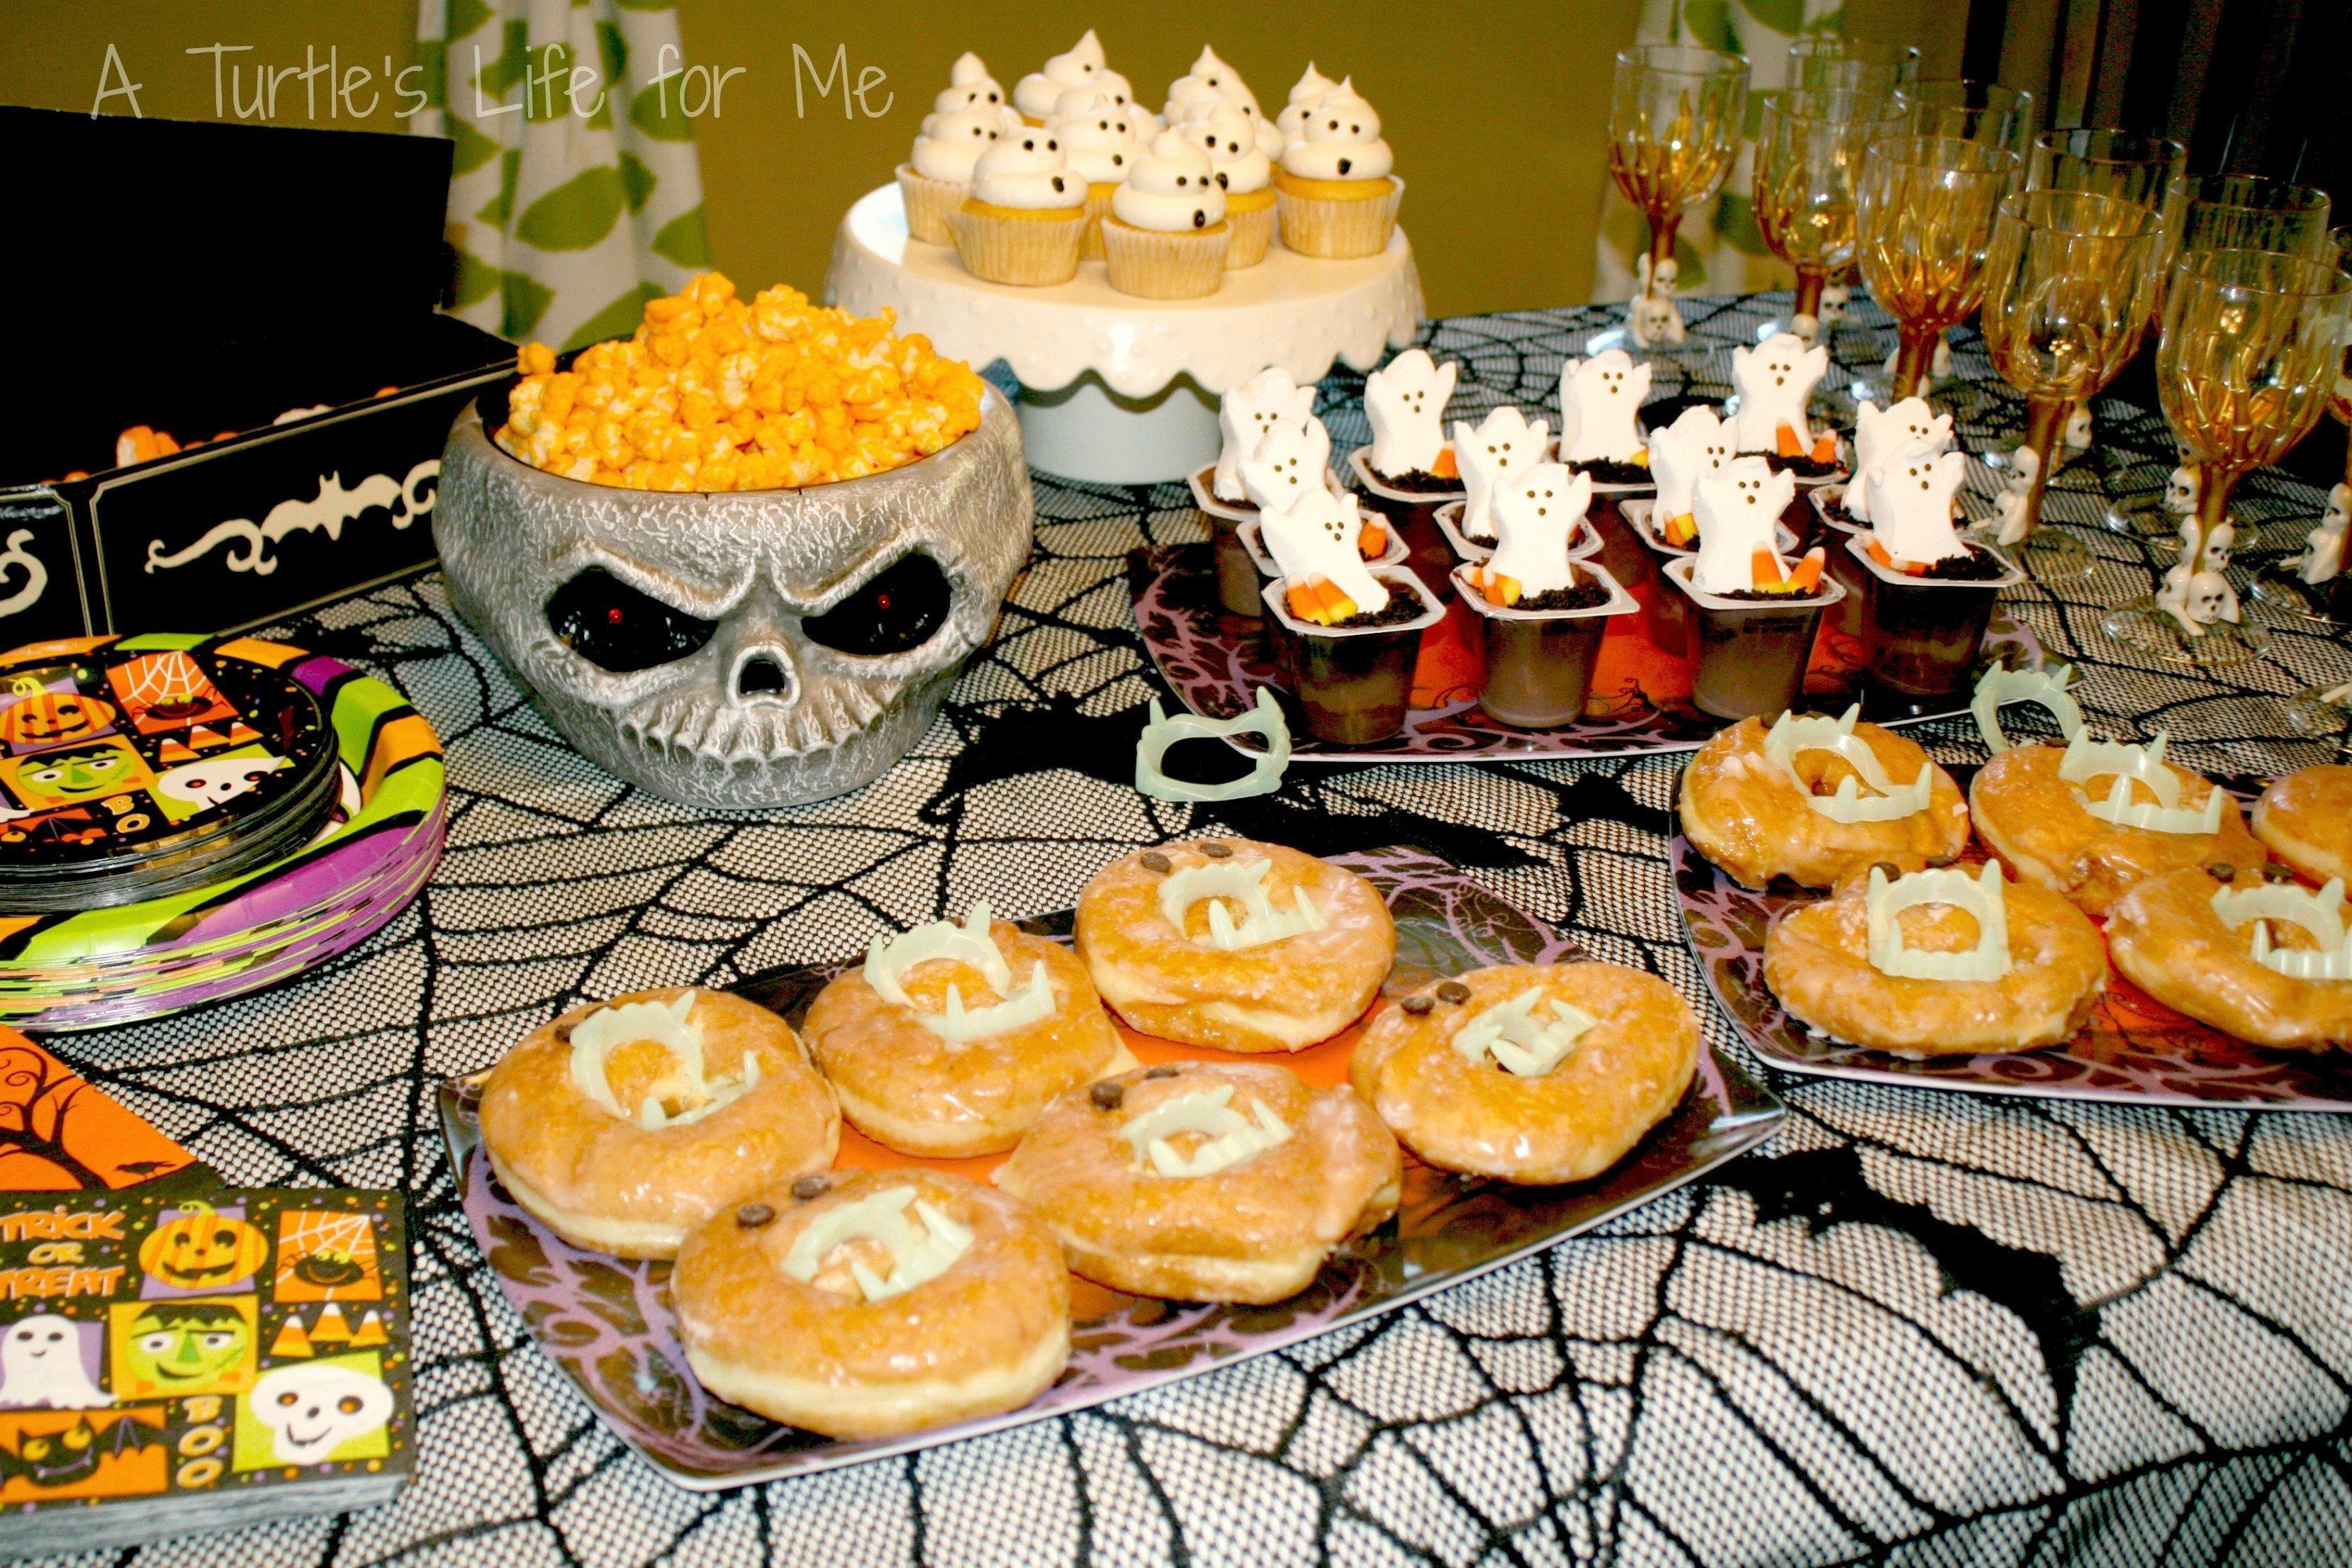 10 Great Kids Halloween Party Food Ideas easiest kids halloween party ever a turtles life for me 2020